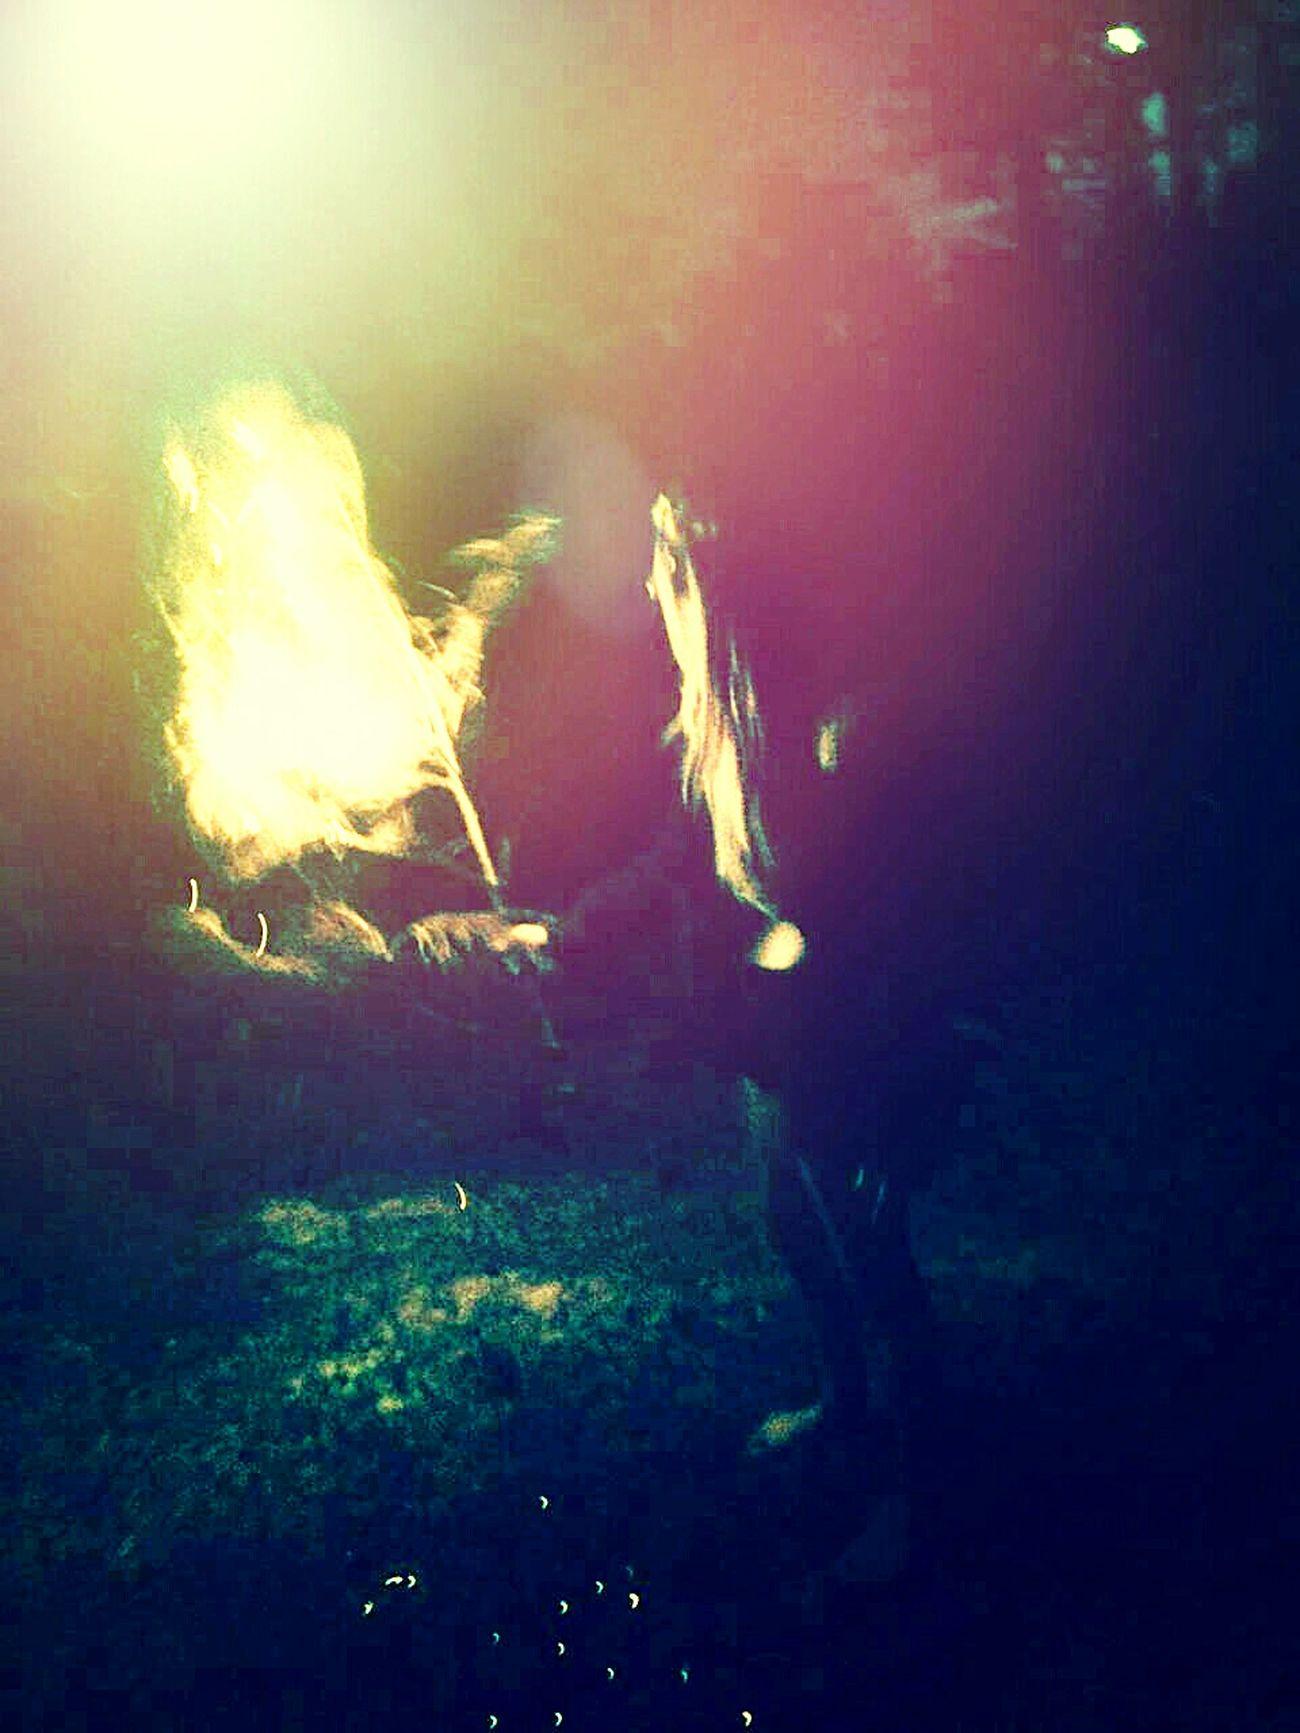 Pyro Nightphotography Hippie✌ Fireinthesky Moonlight Campfire PlayingwithFIRE Jenbearadventures Greatballsoffire